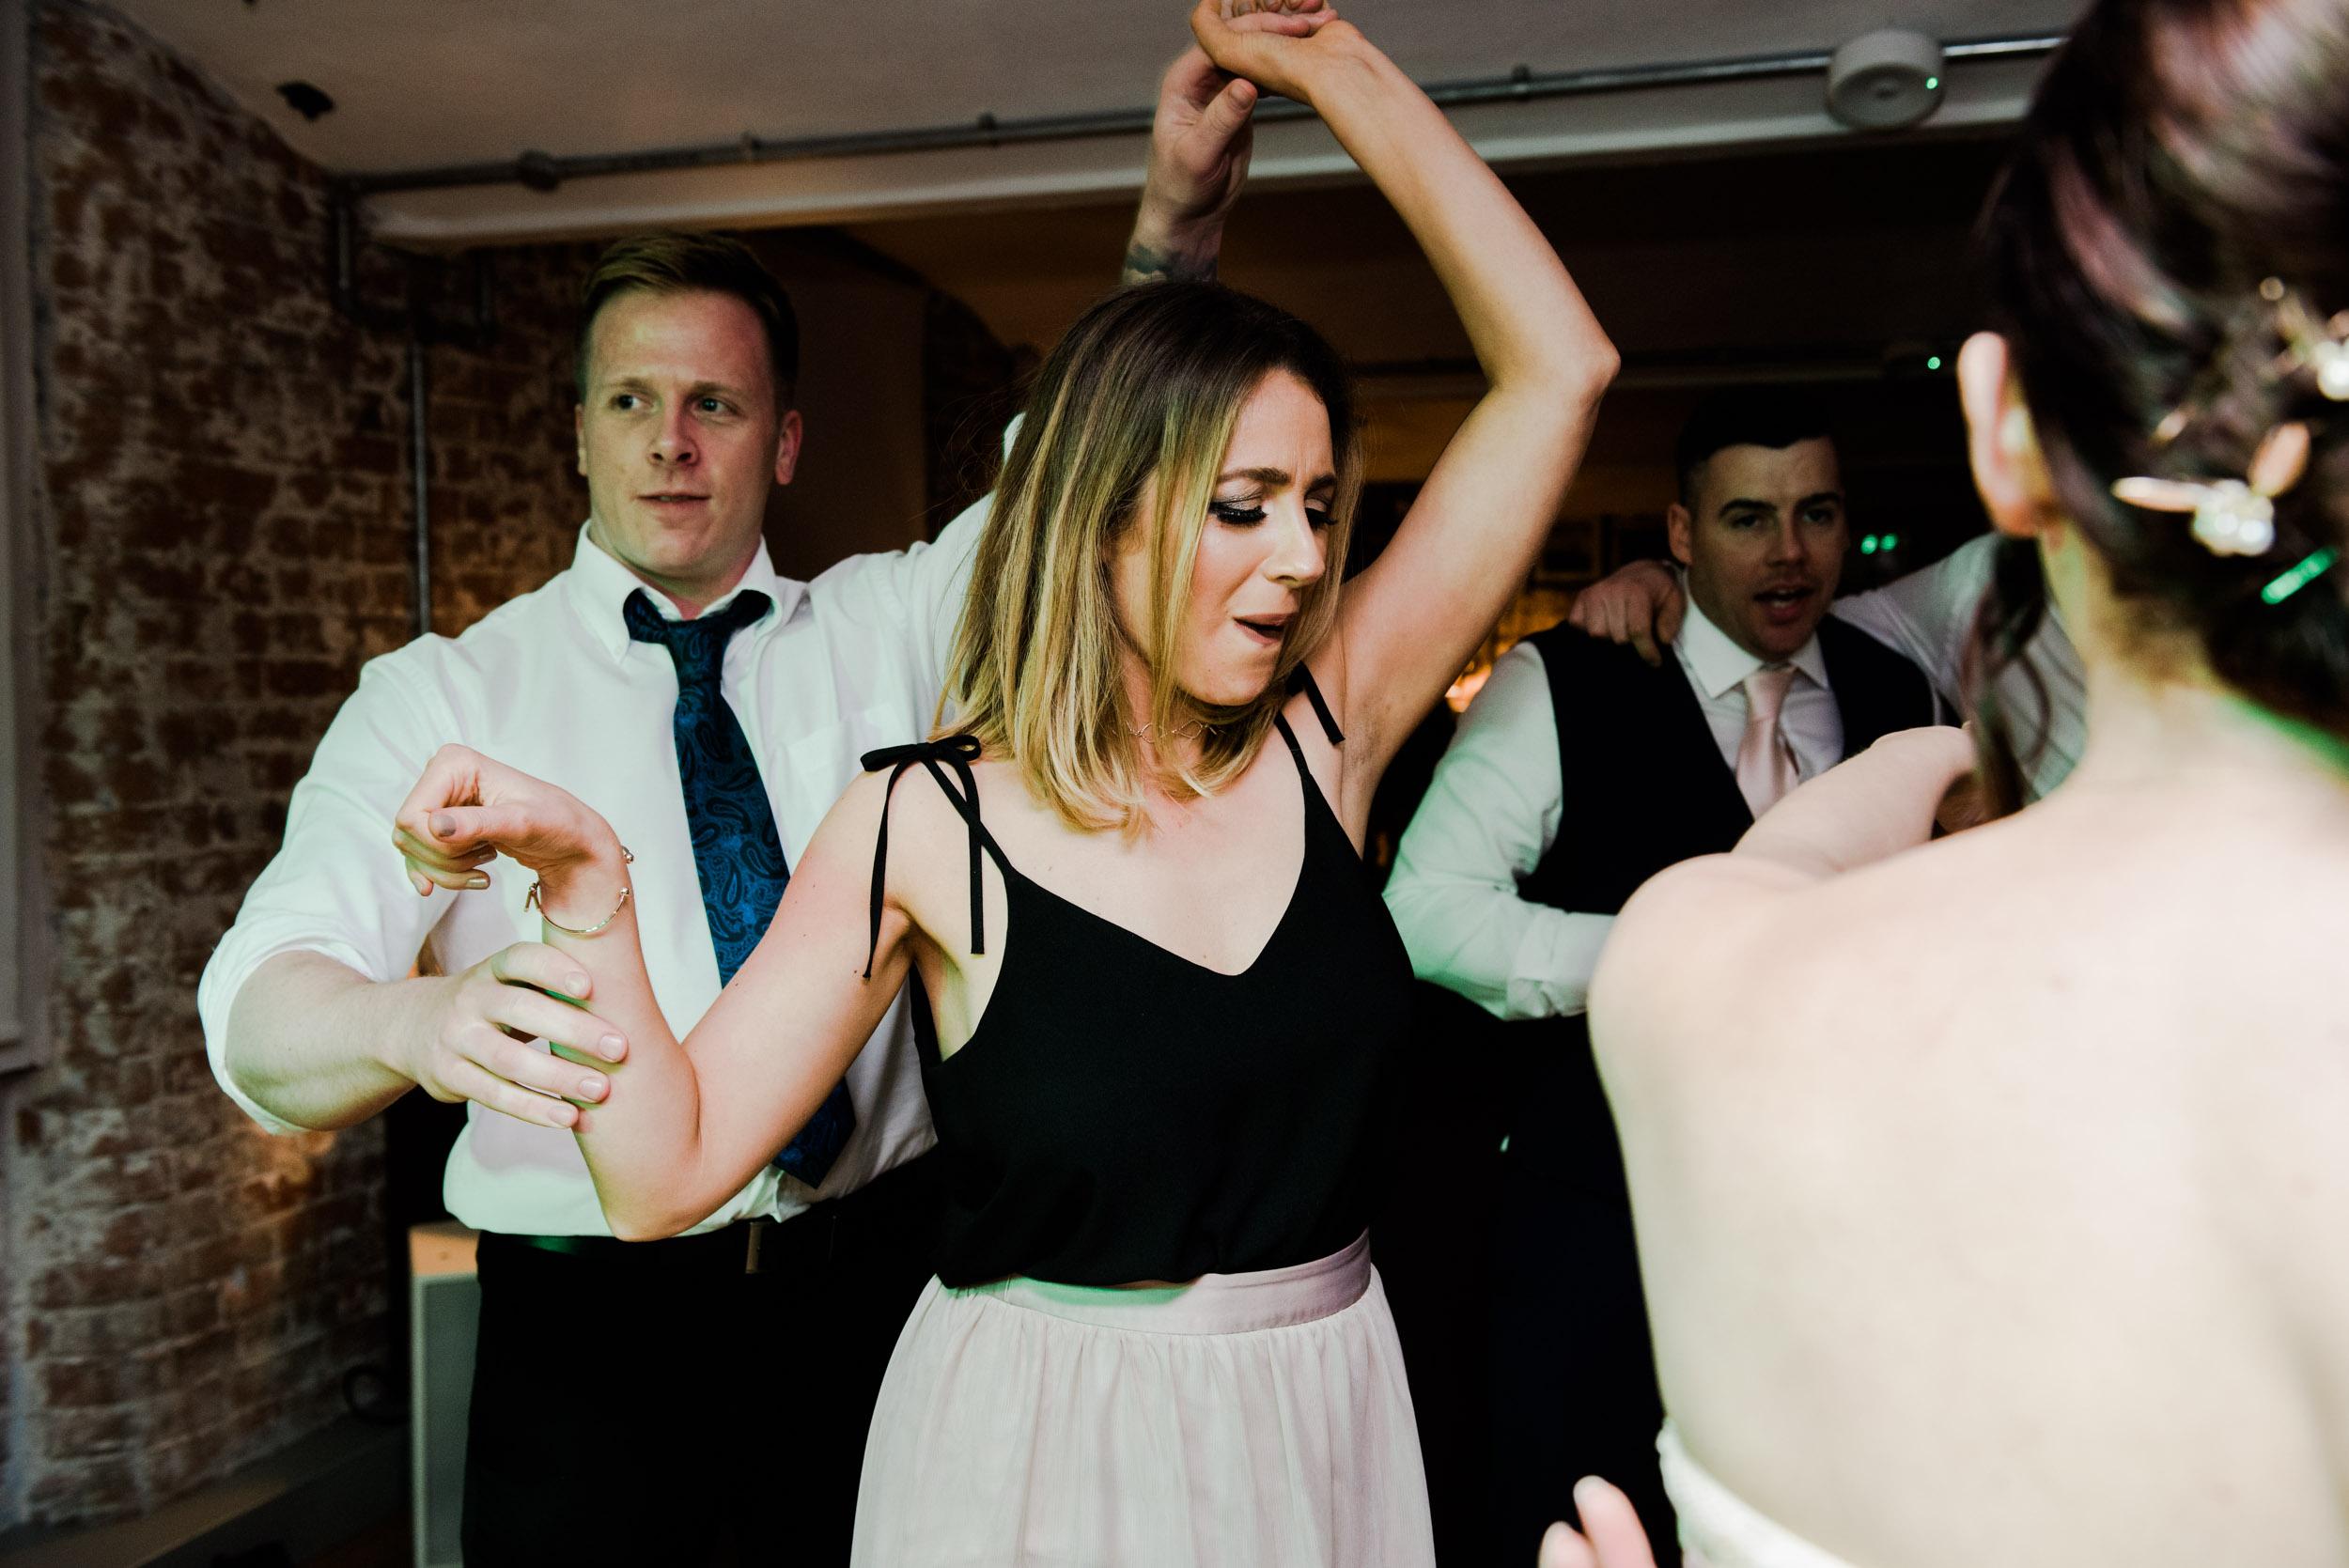 Industrial_glamour_wedding_west_mill_derby183